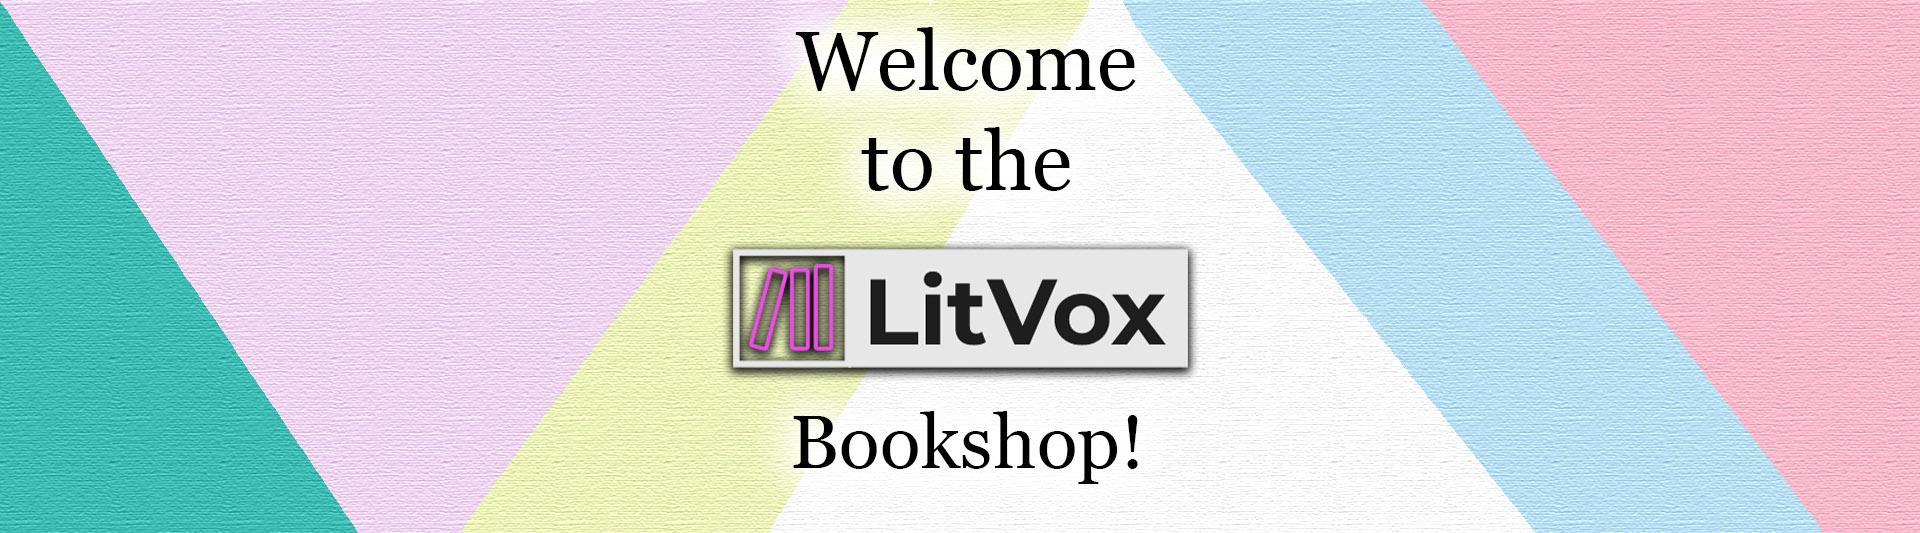 LitVox Irish Bookshop - Ireland's best place to buy books online